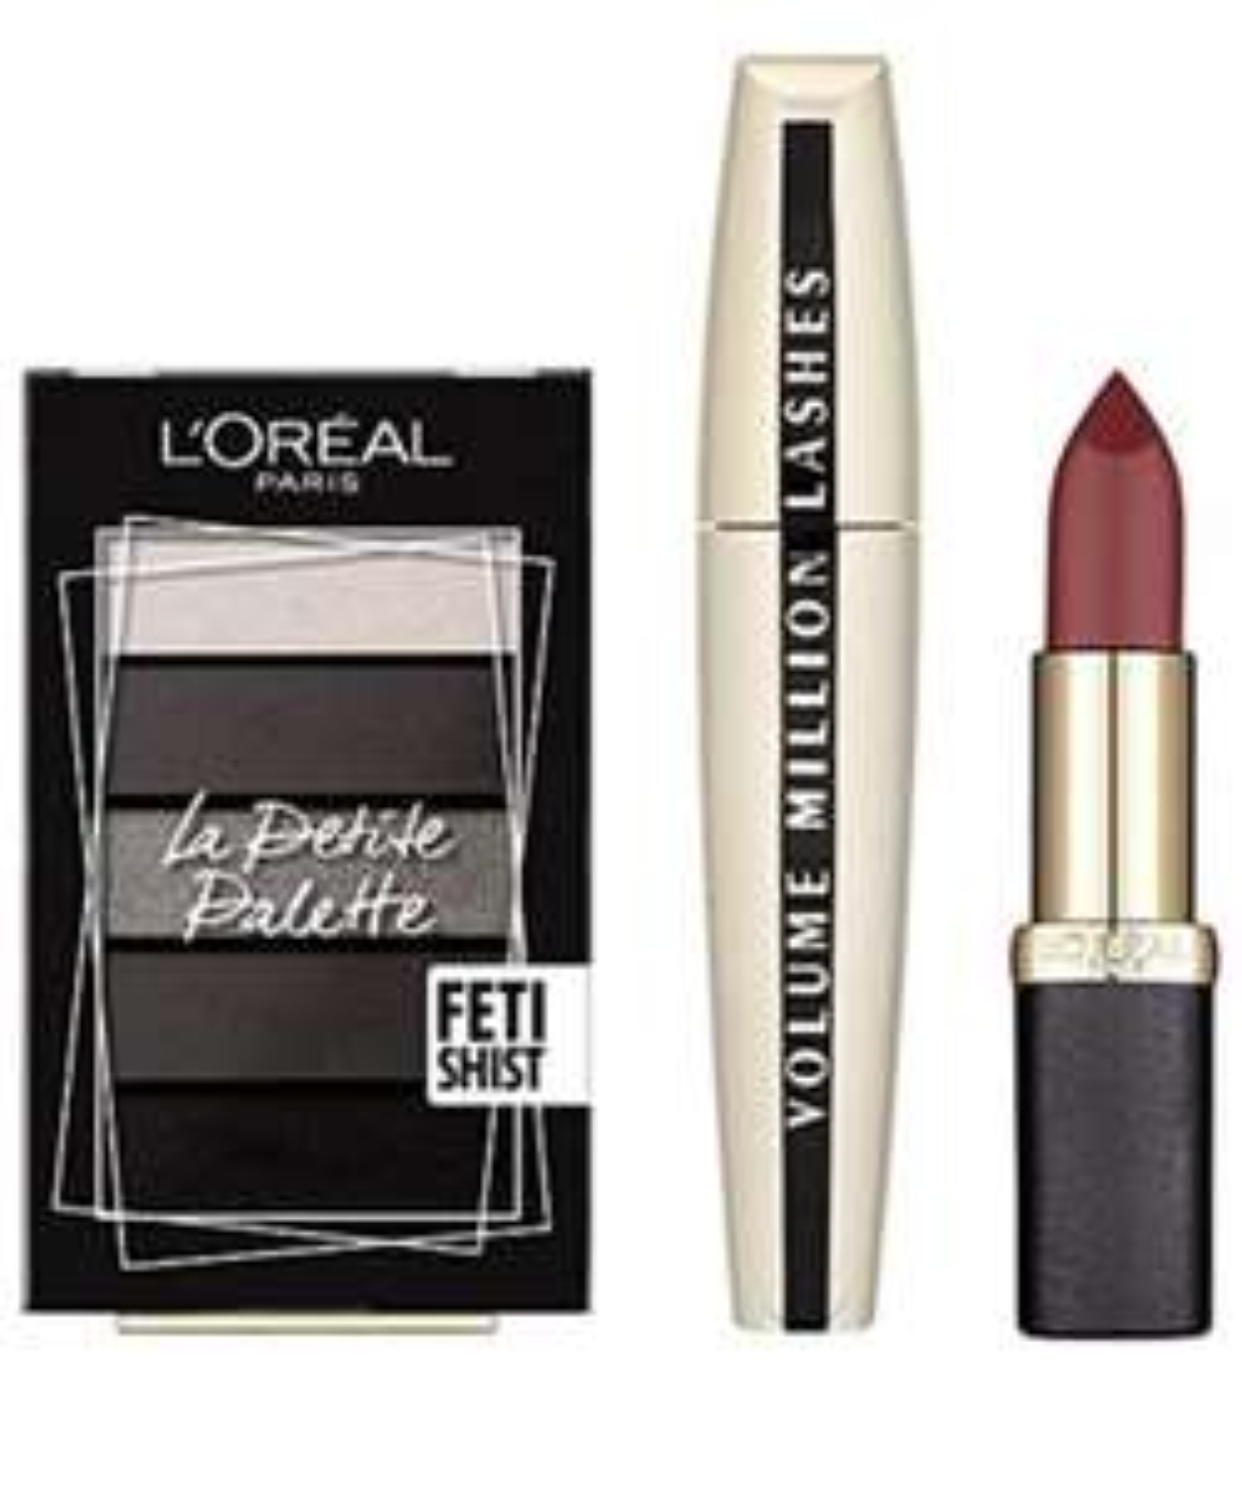 L'Oreal Paris Glam Me Up Party  Makeup Trio for £11.95 (Prime) / £16.44 (non Prime) Amazon